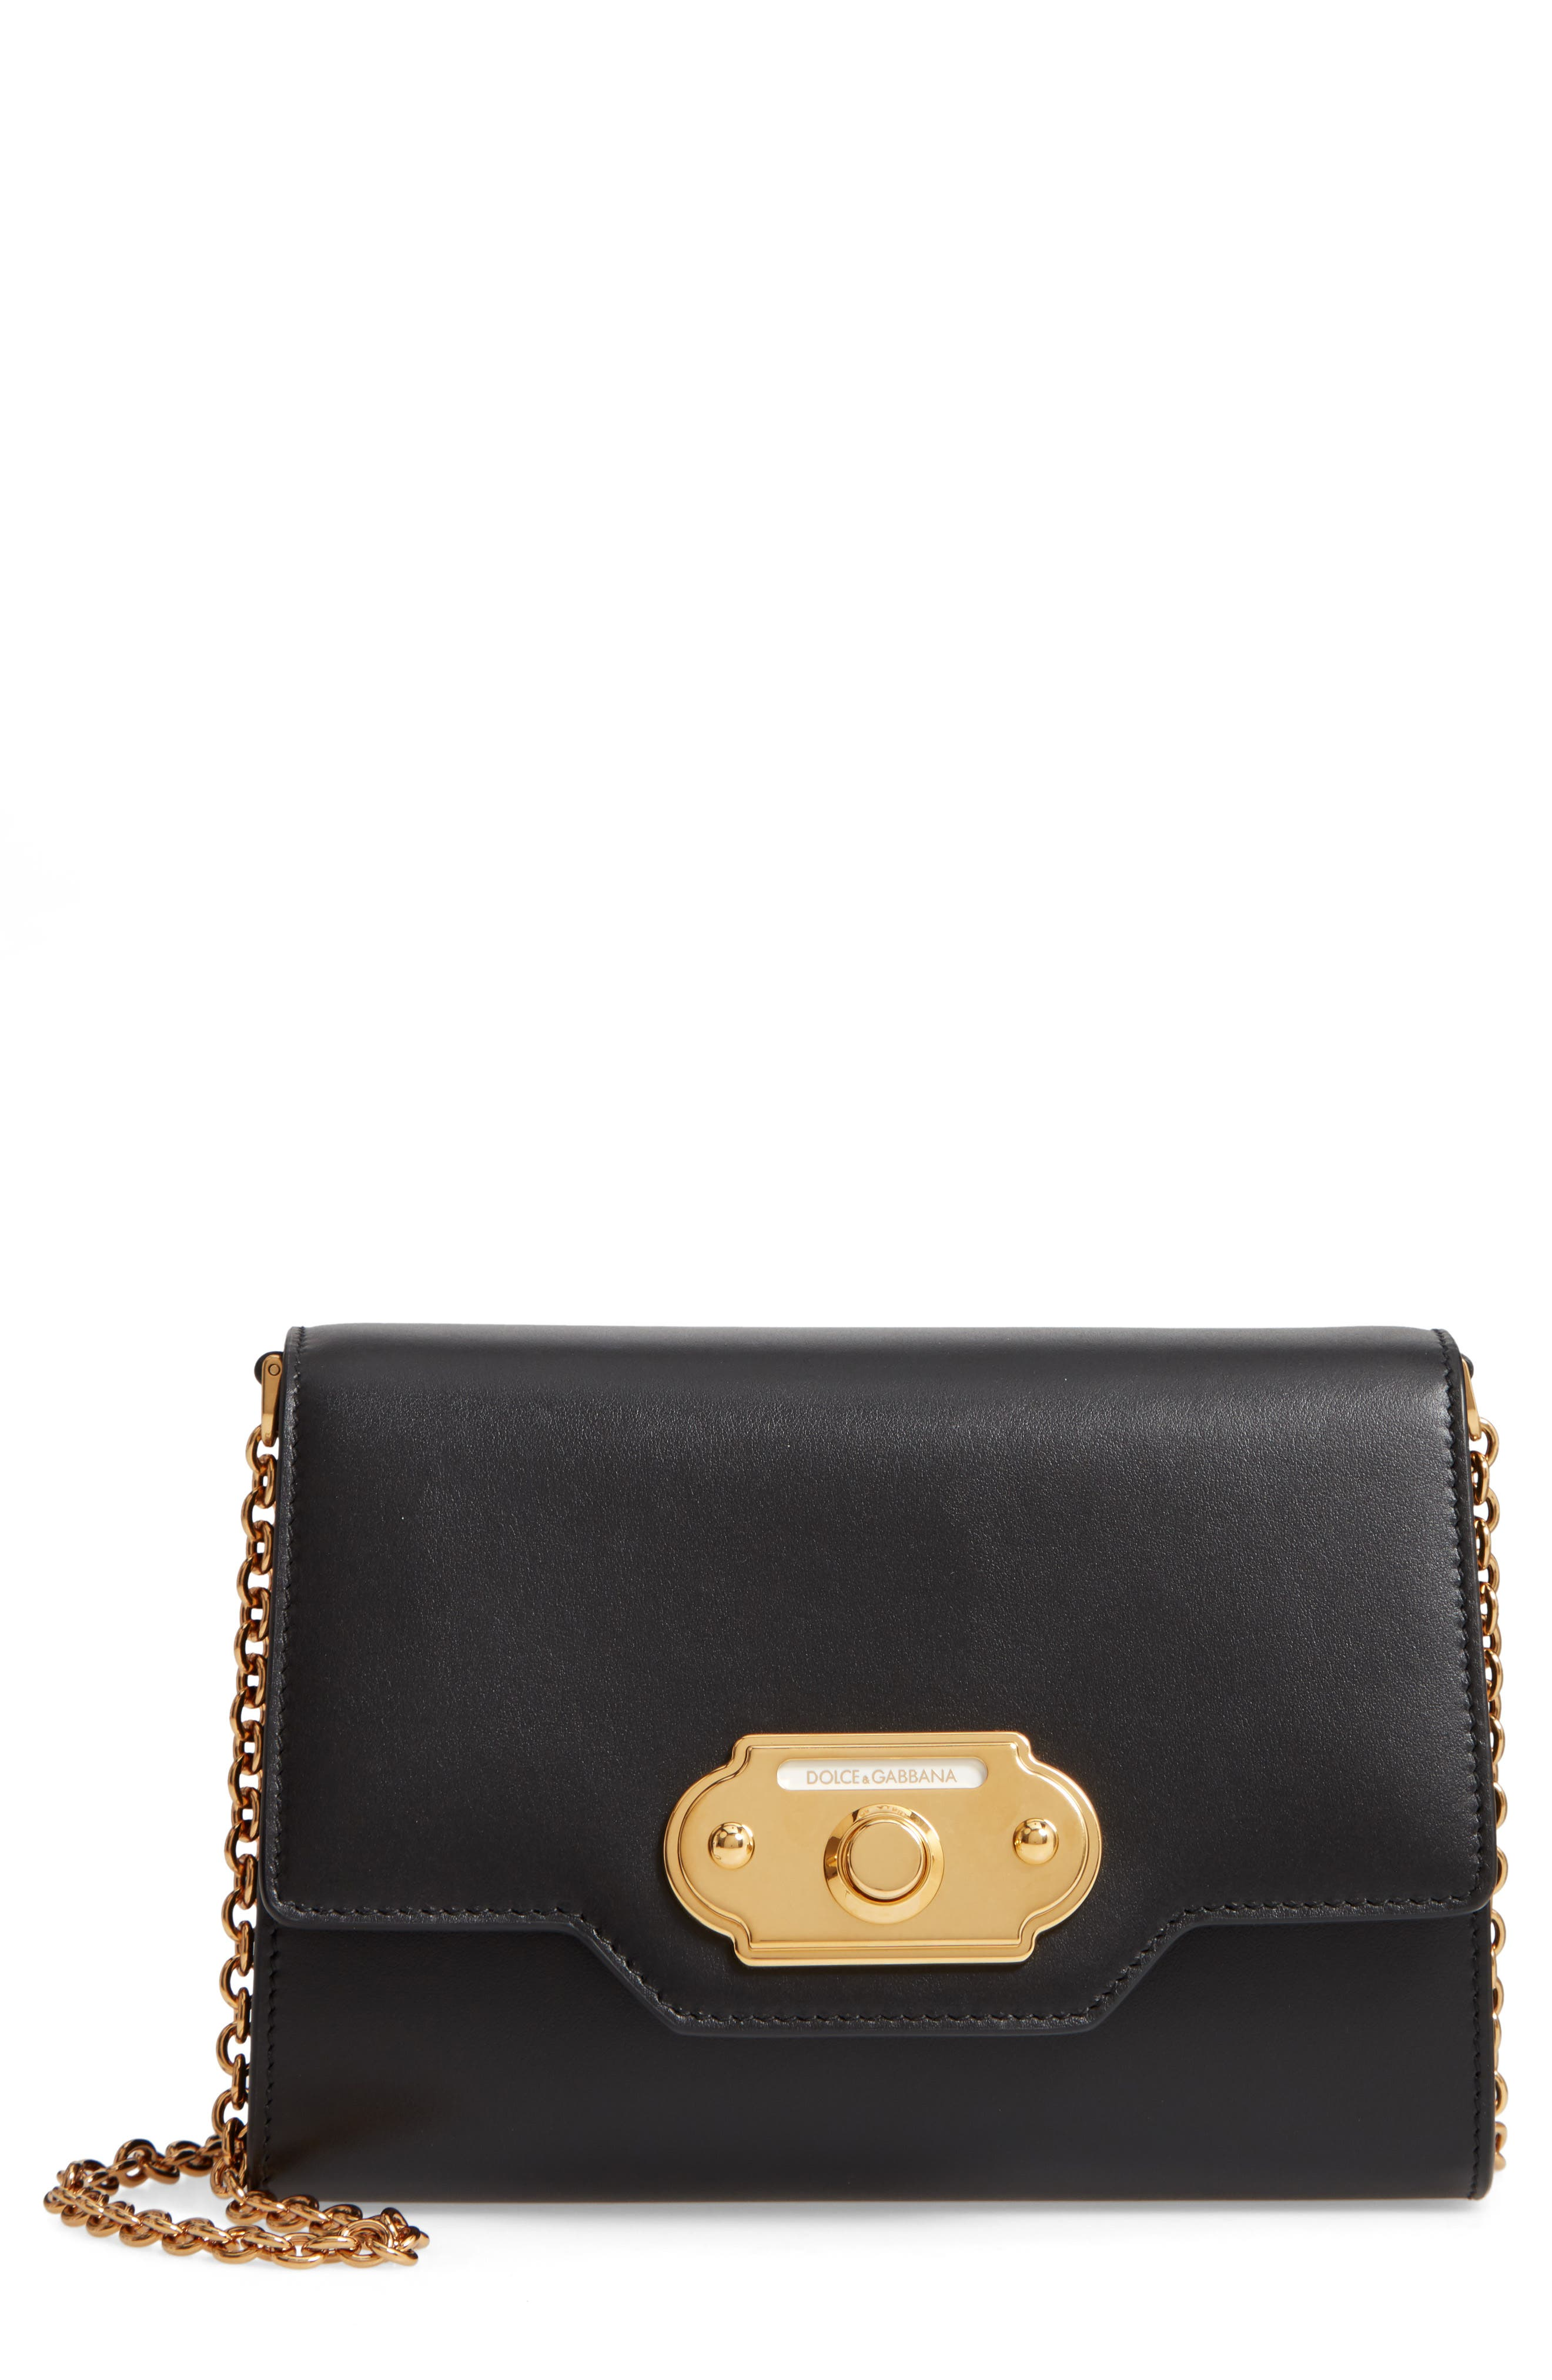 DOLCE&GABBANA Leather Clutch, Main, color, NERO